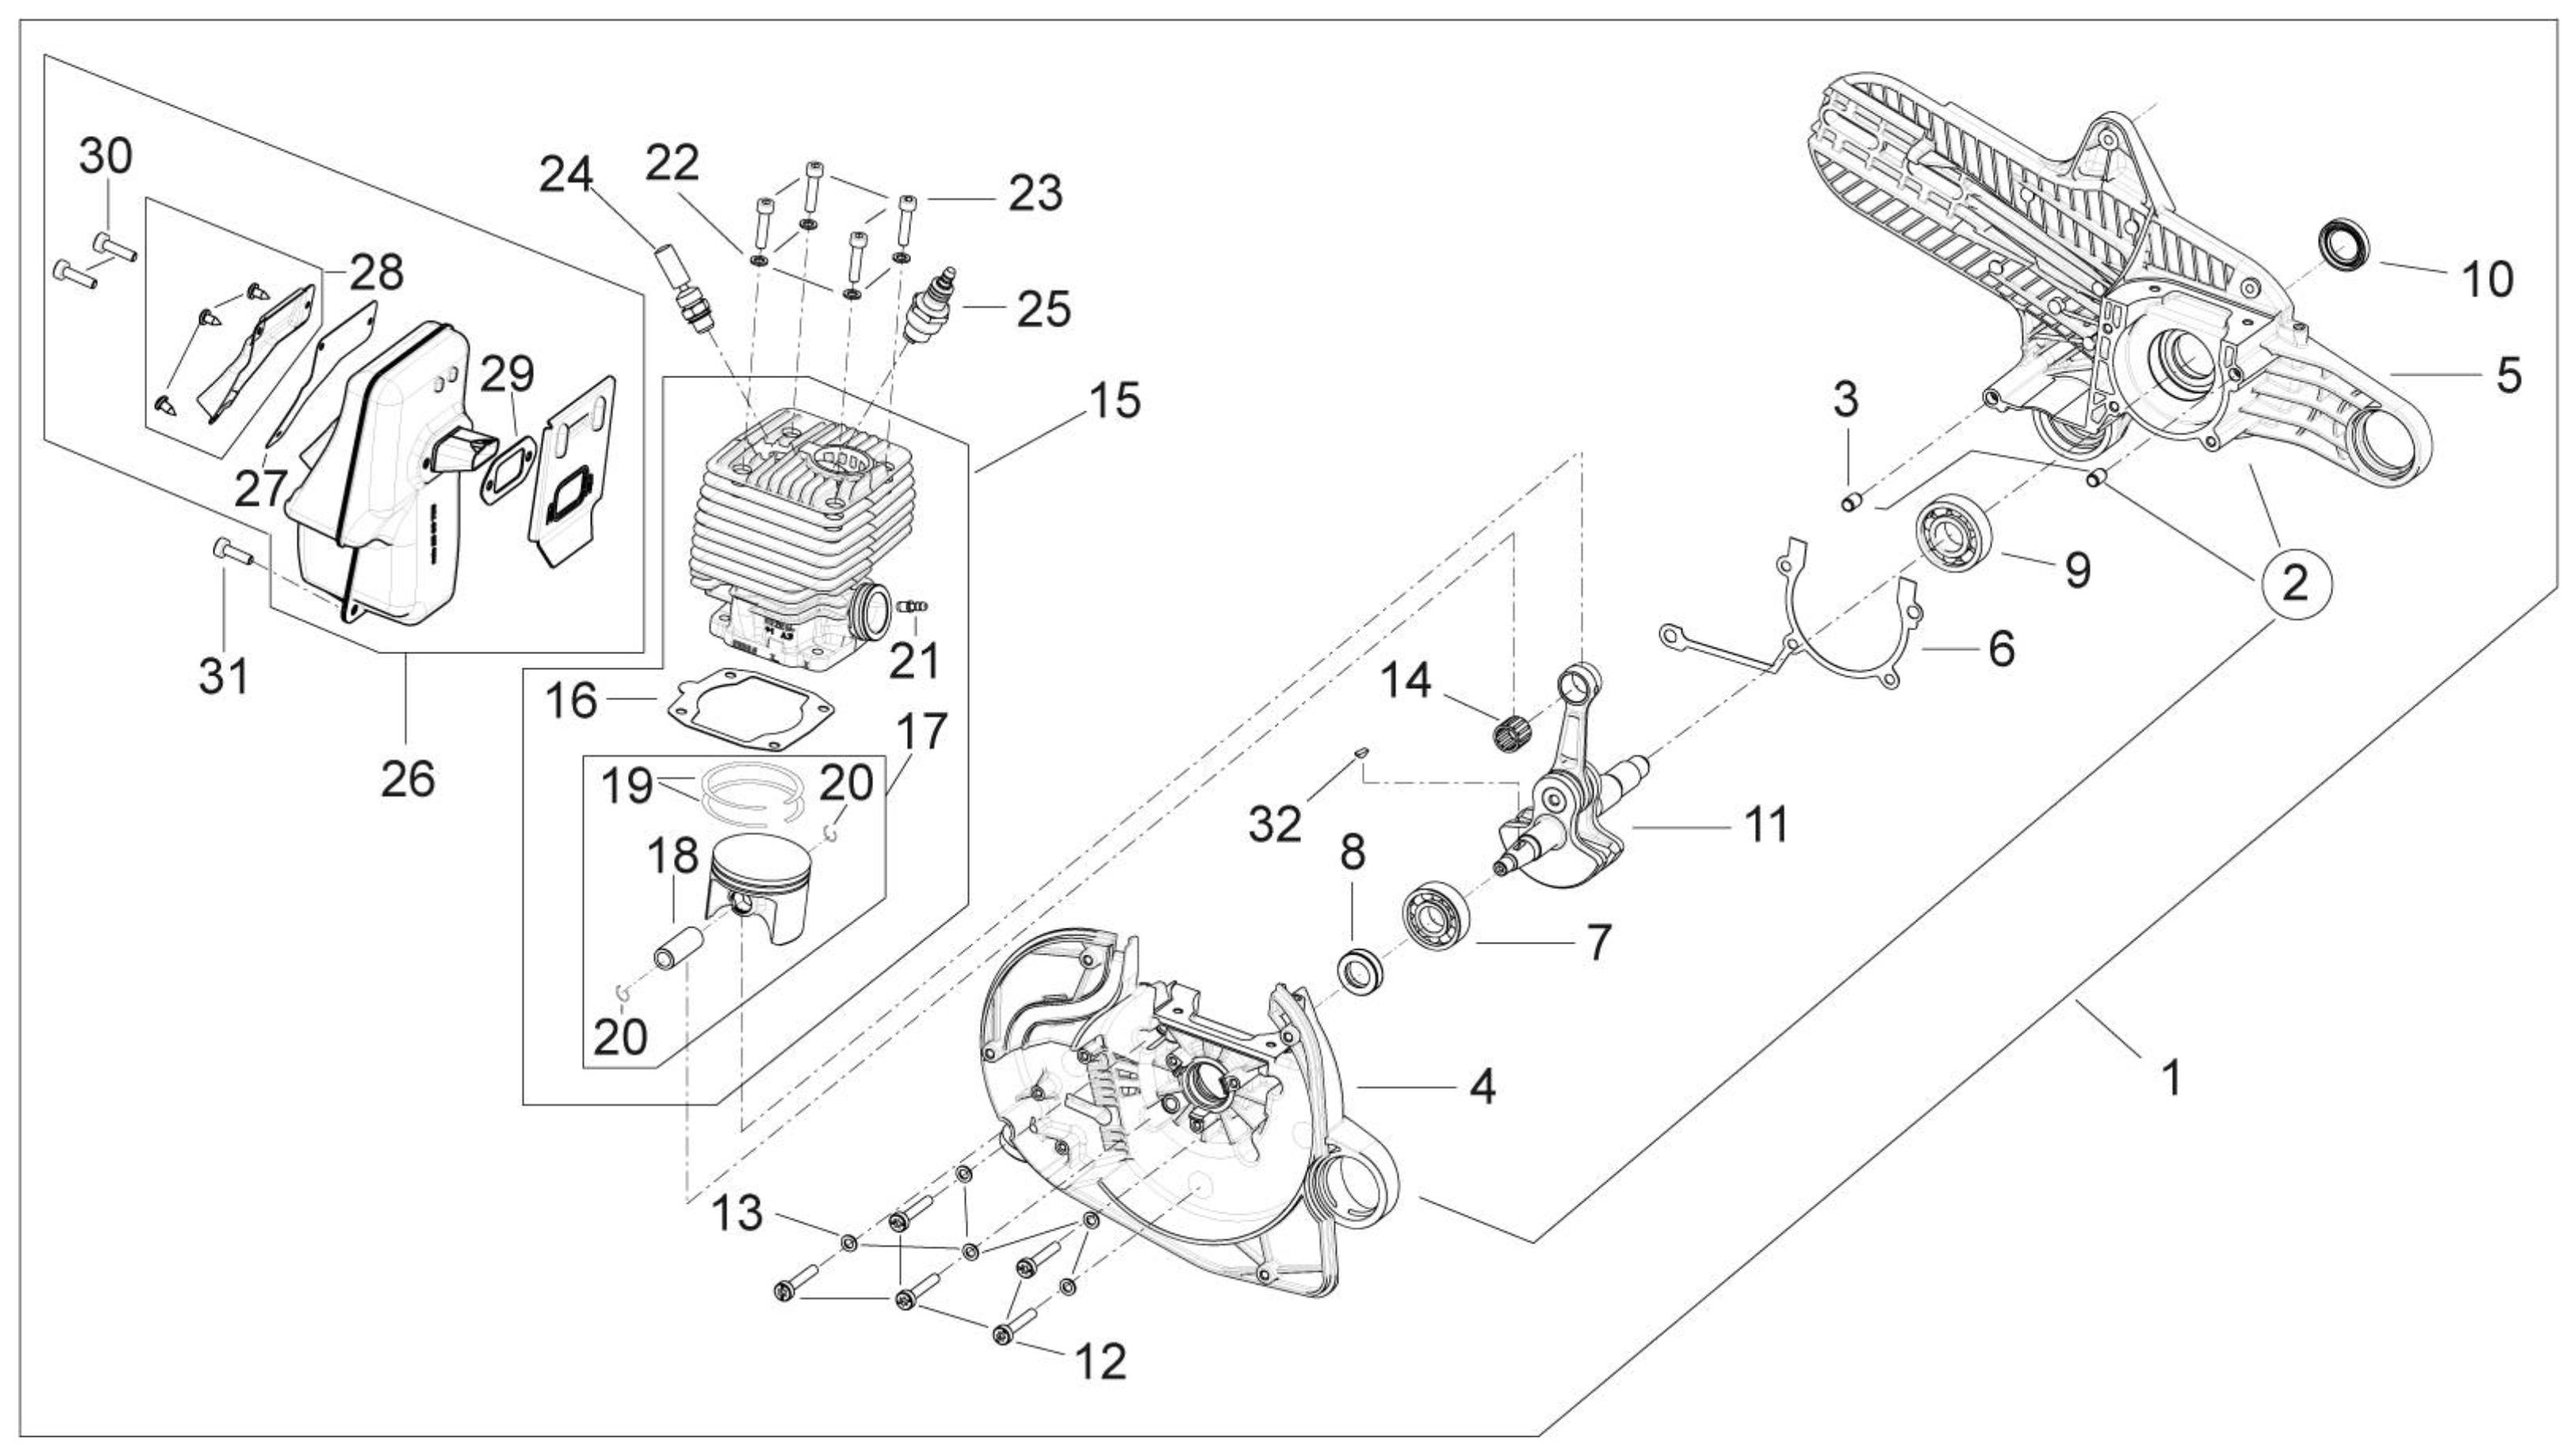 881-14-assemblyengine.jpg